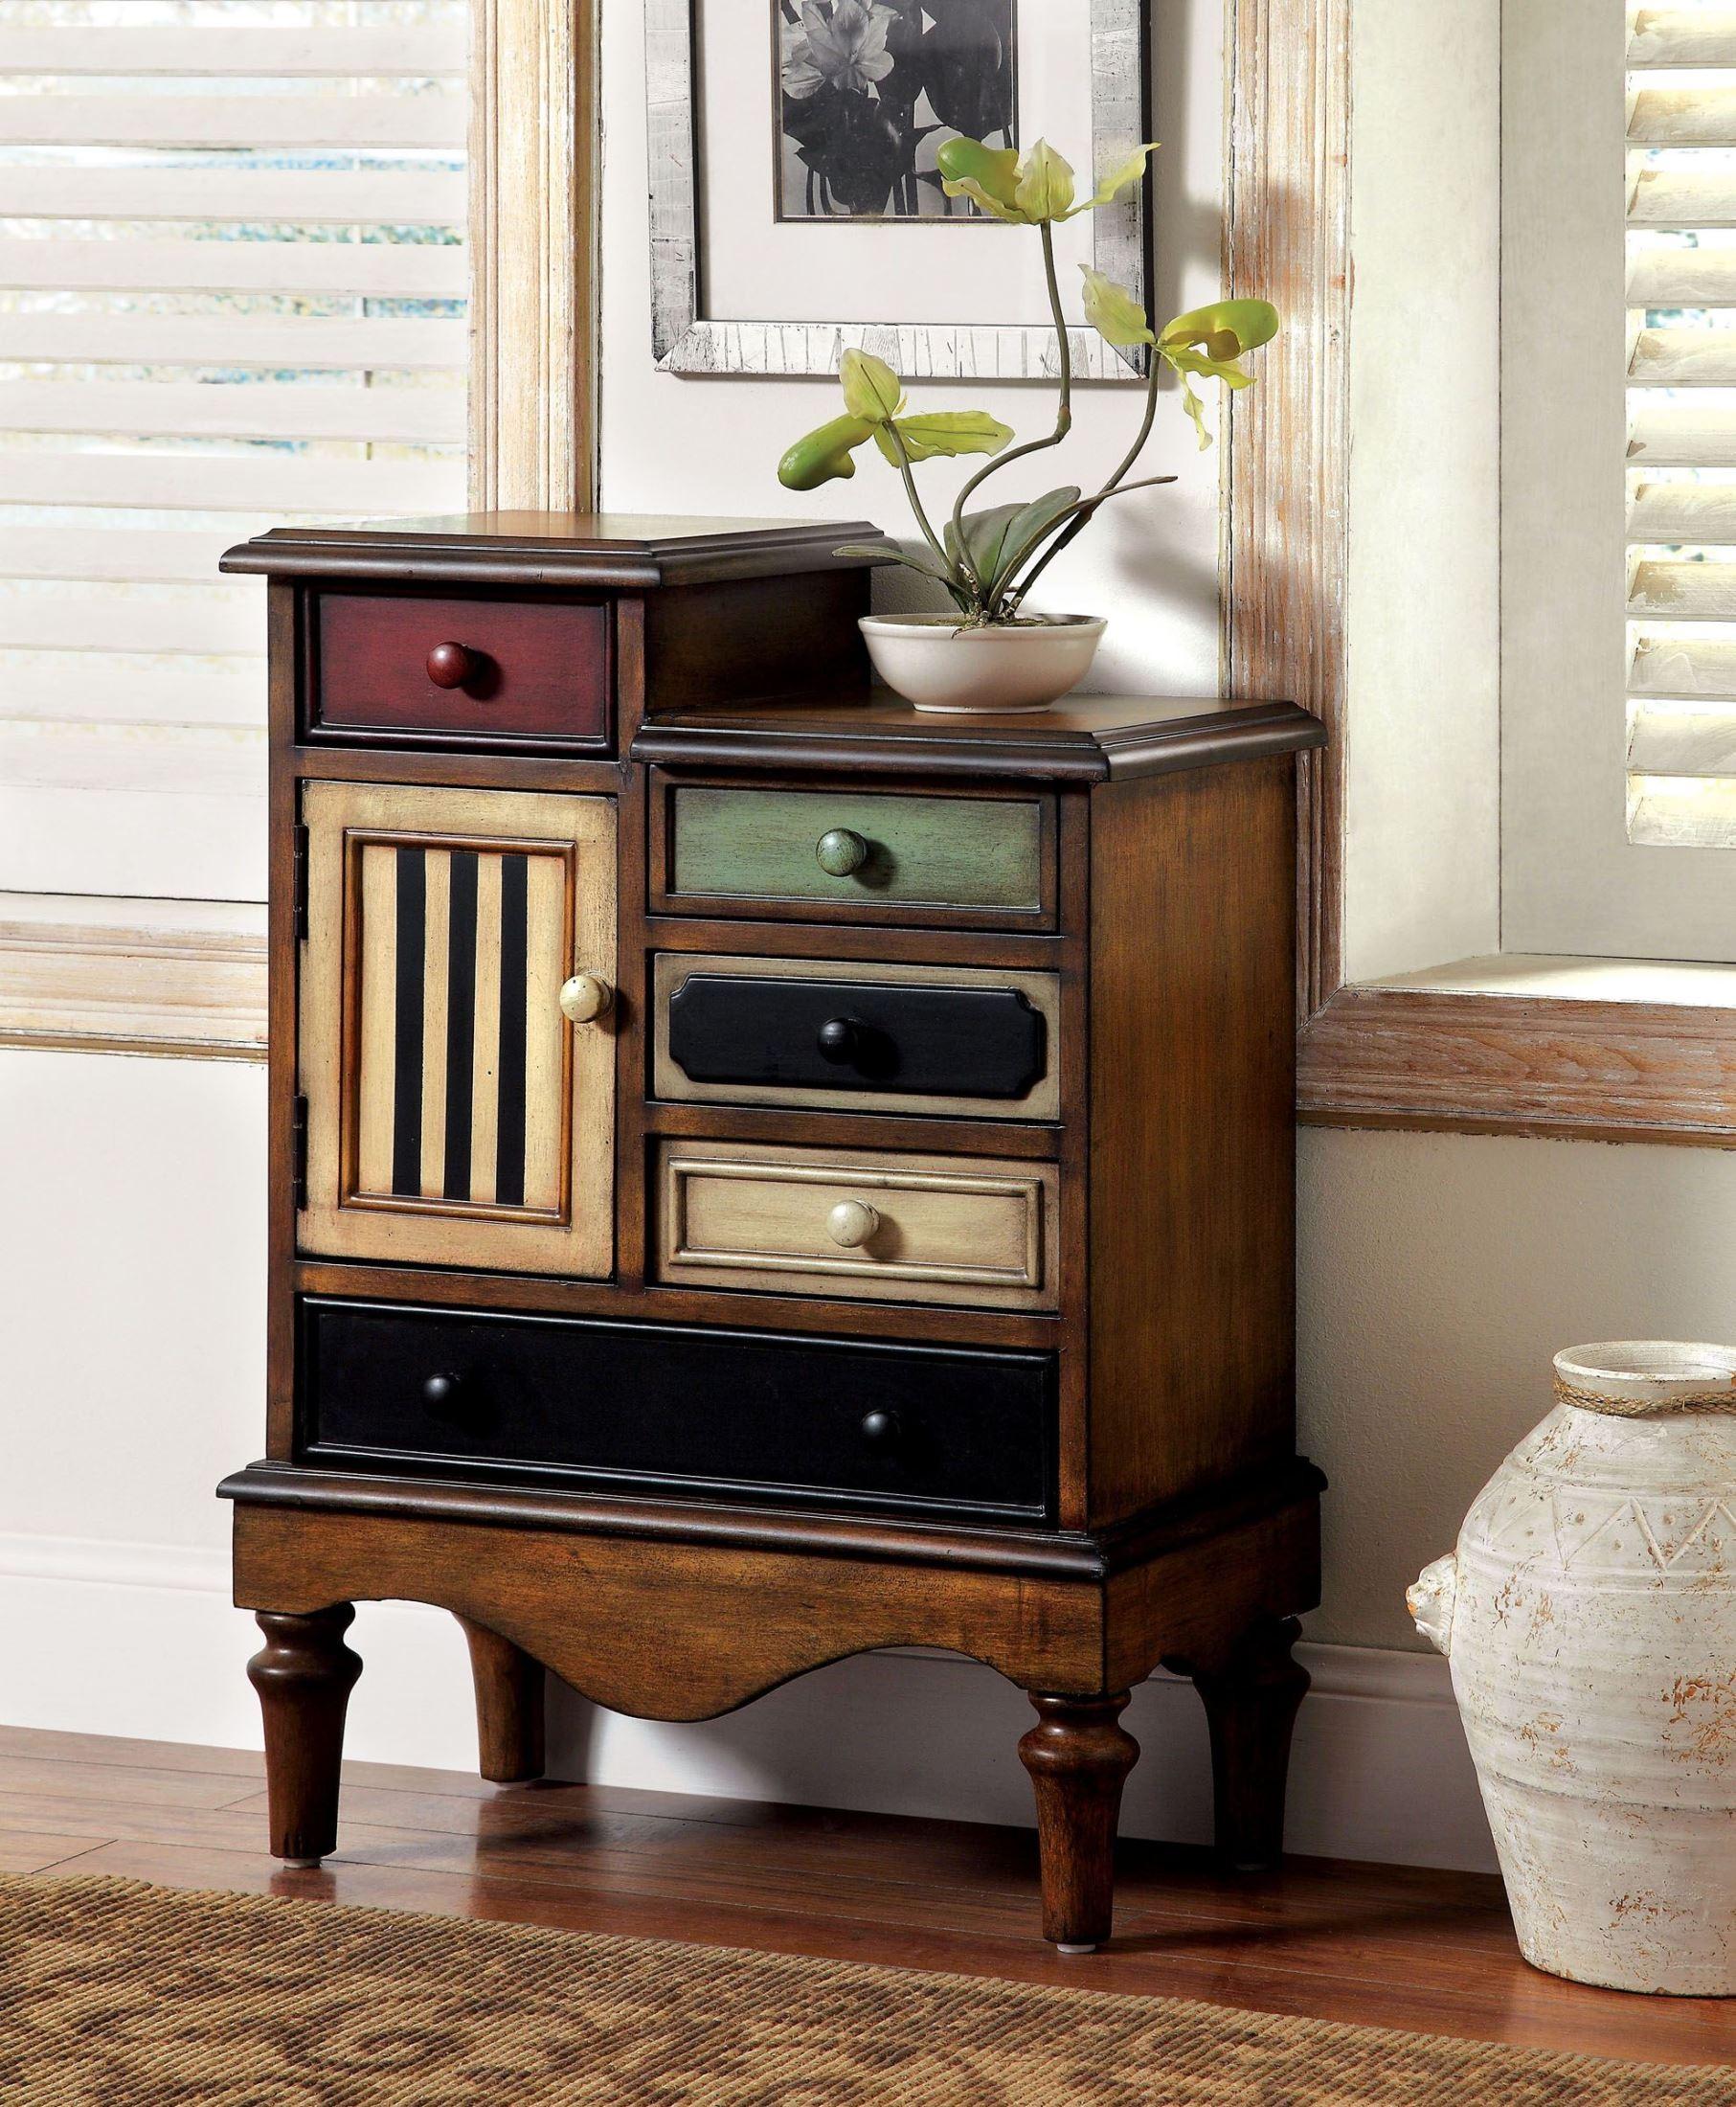 Neche Multi Color Accent Chest From Furniture Of America Cm Ac145 Coleman Furniture